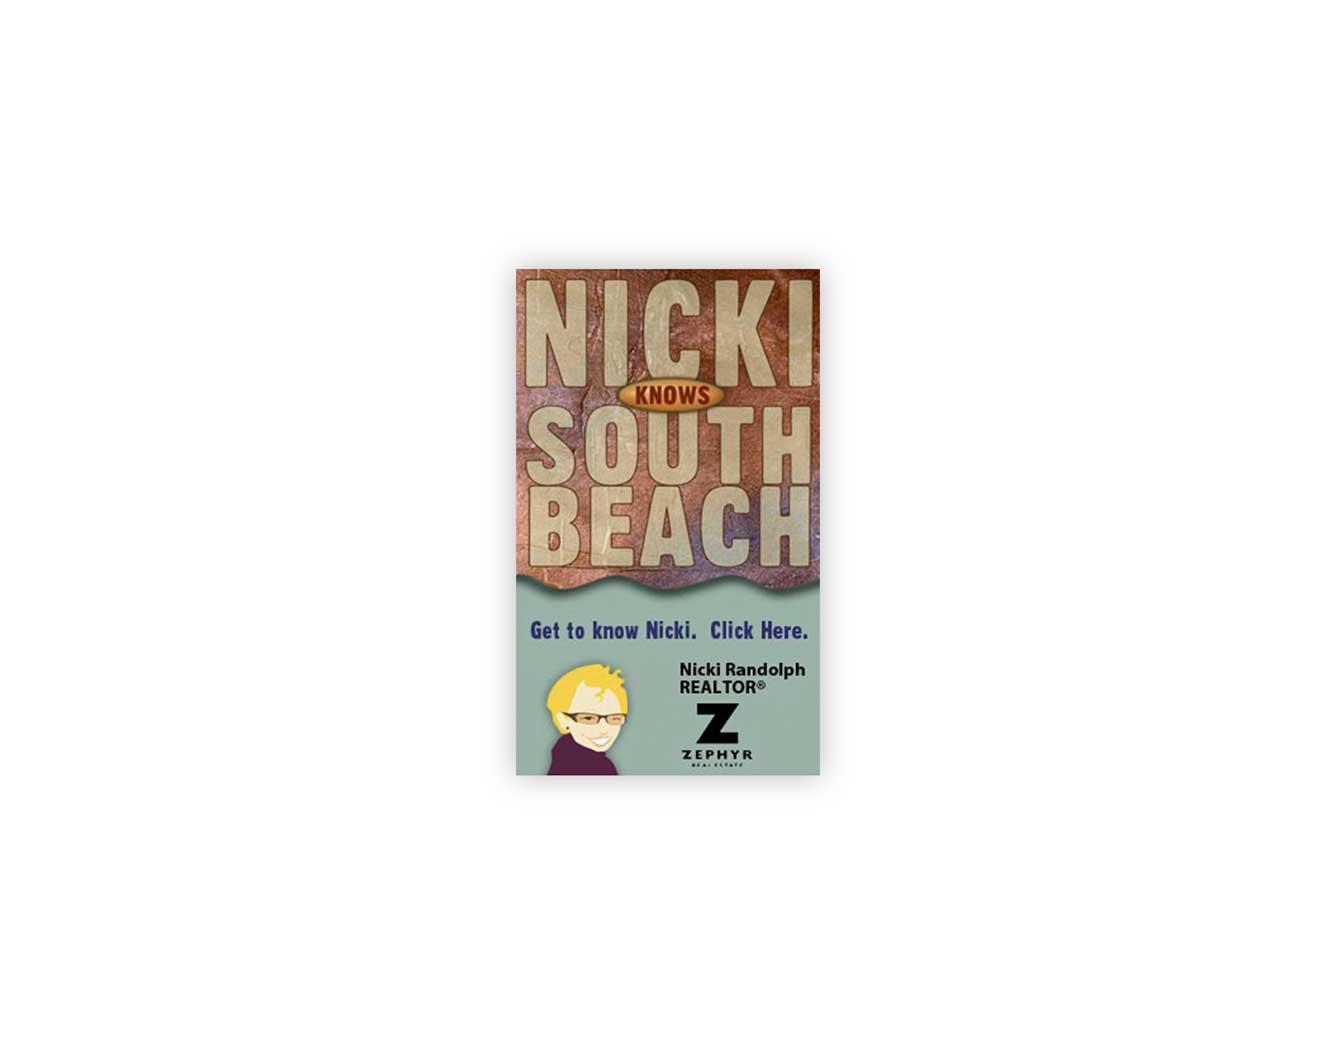 Campaign- Nicki Randolph